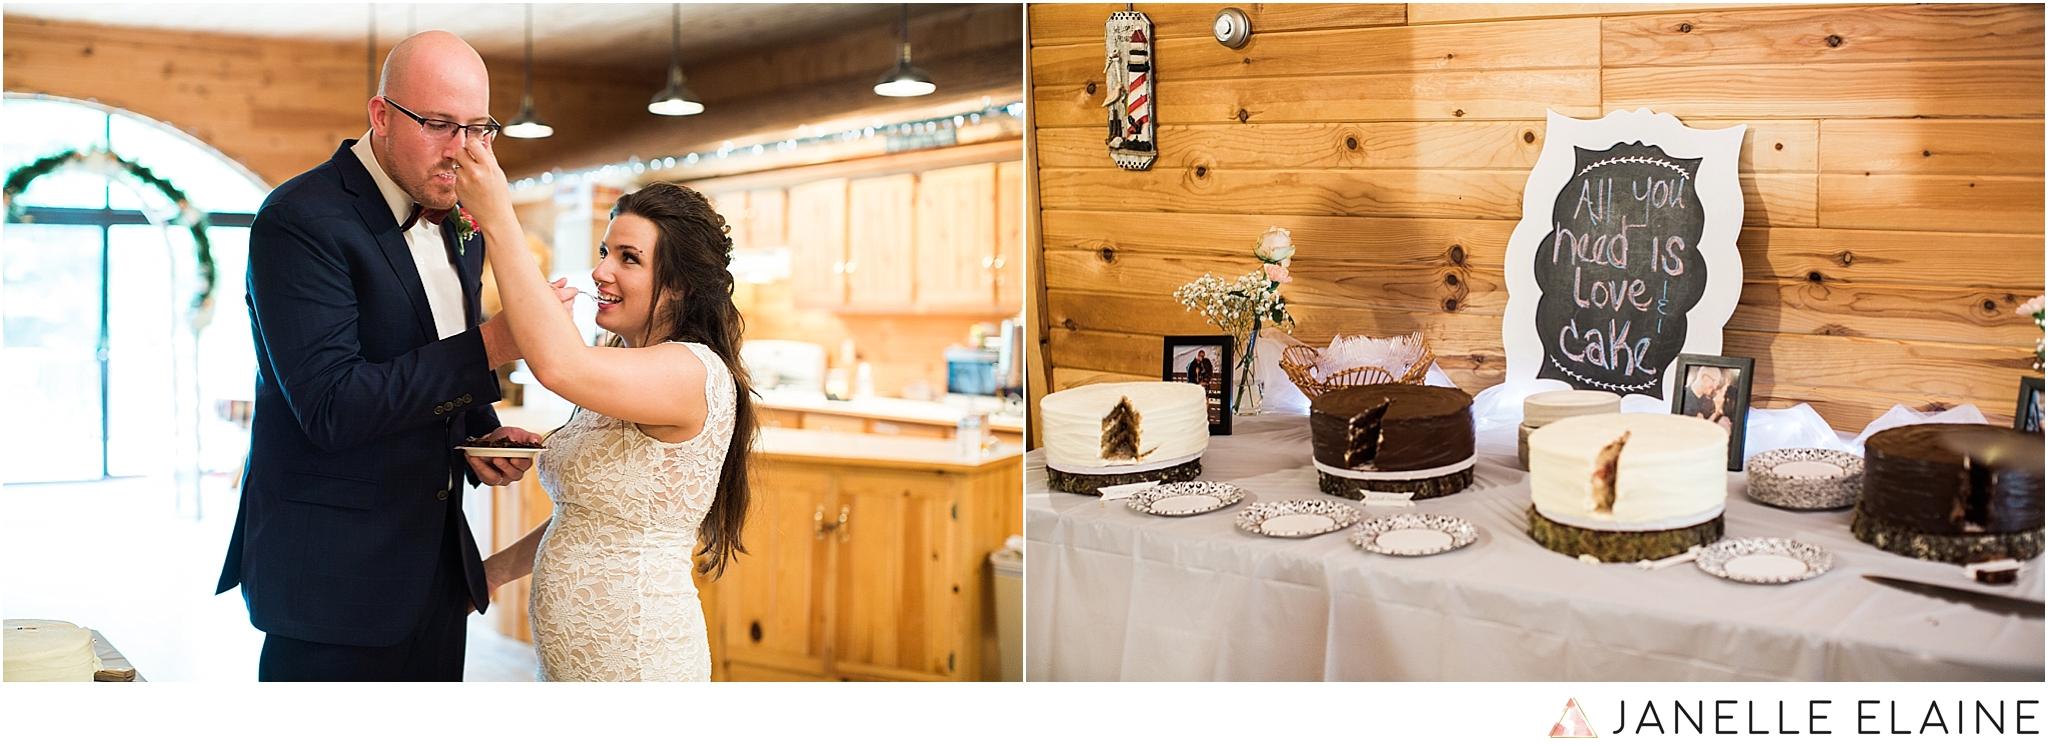 janelle elaine photography-seattle-destination-wedding-photographer-128.jpg